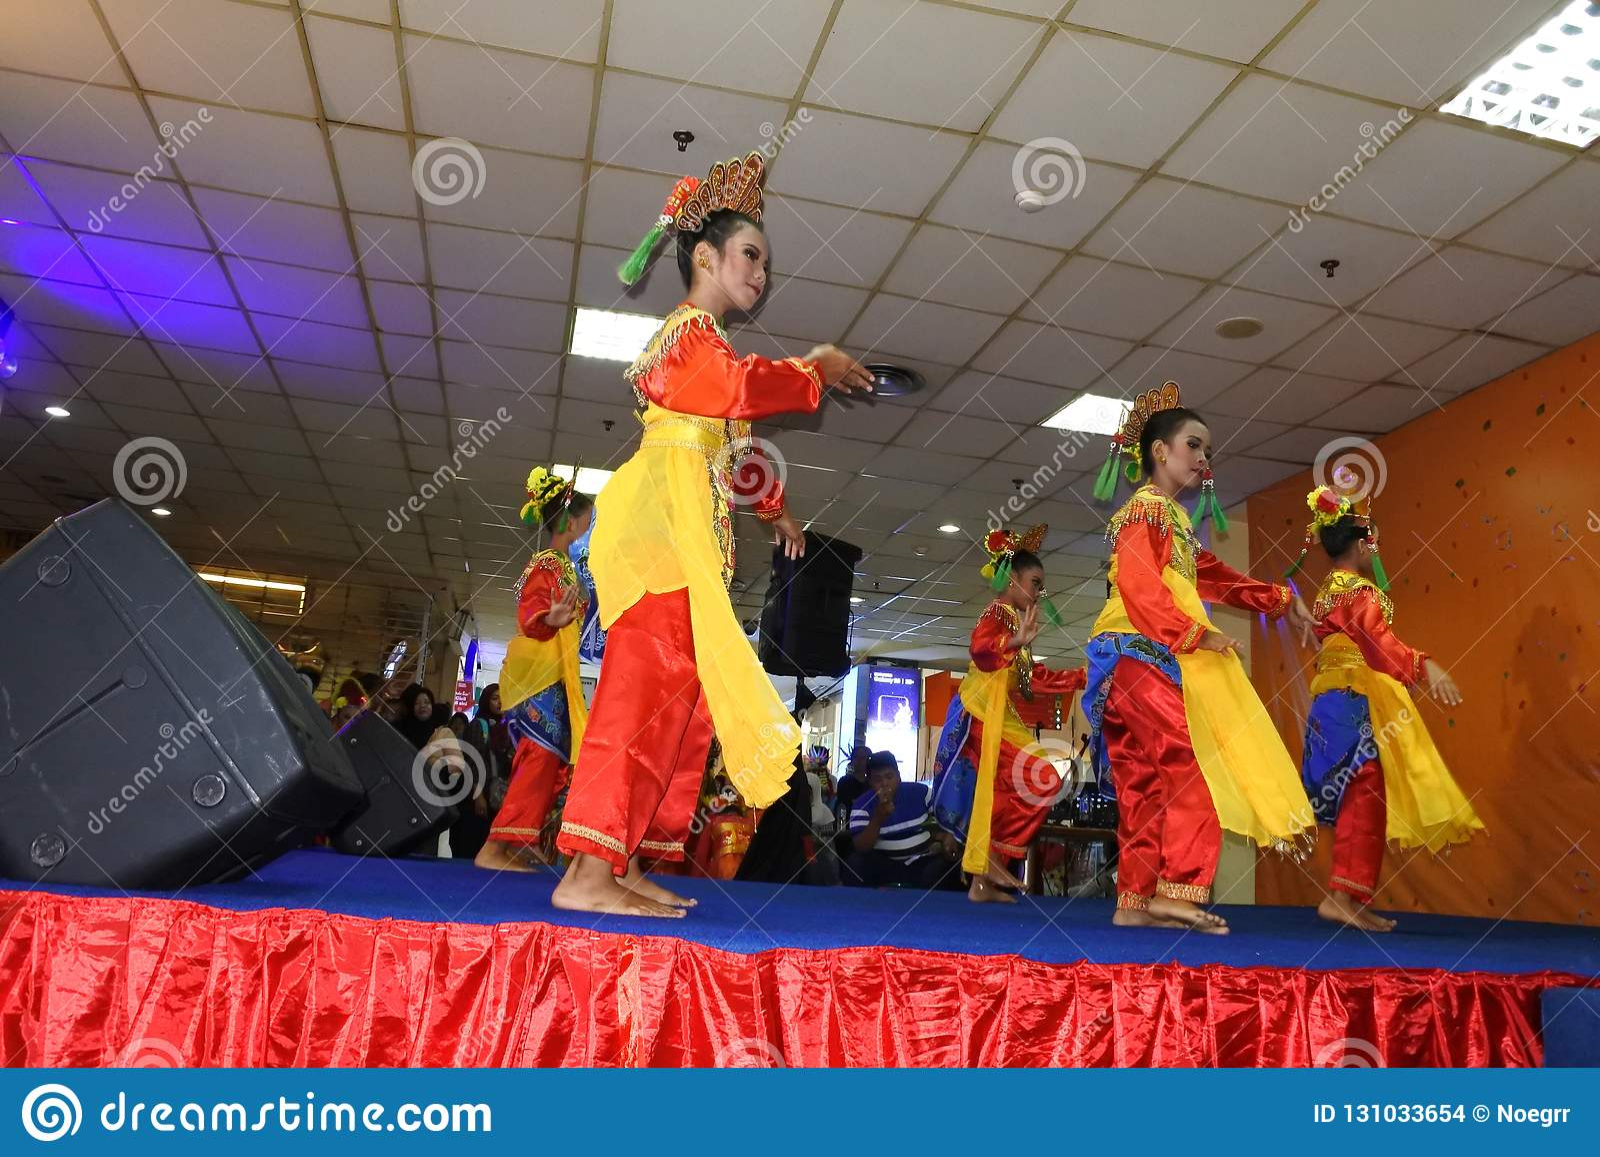 Indonesia Bali October 5 2018 Indonesian Stock Photo Edit Now